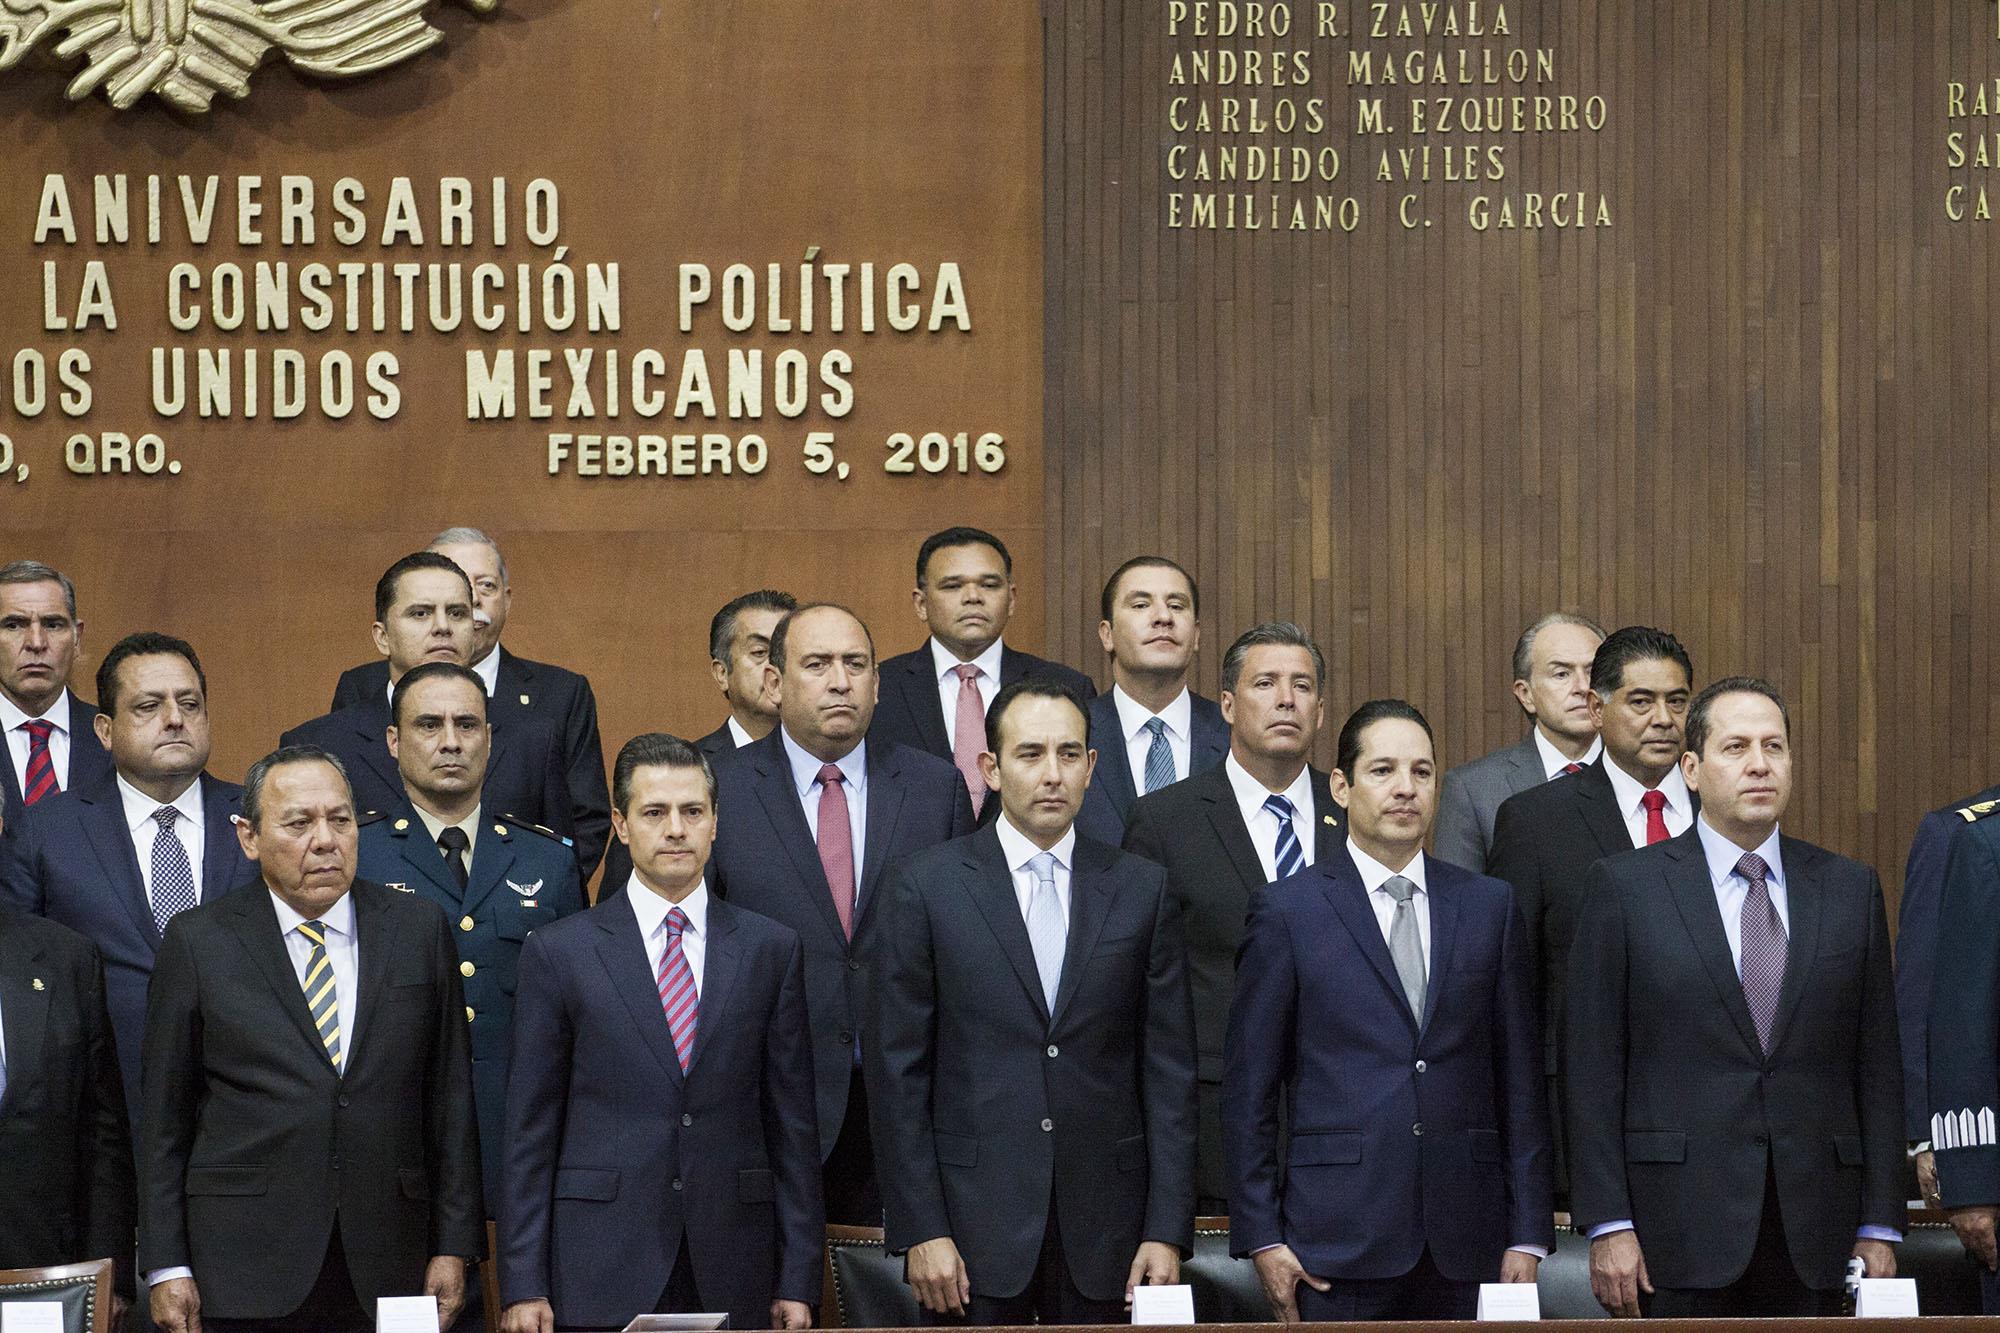 Acude Zapata Bello a99 aniversario de promulgación de la Carta Magna